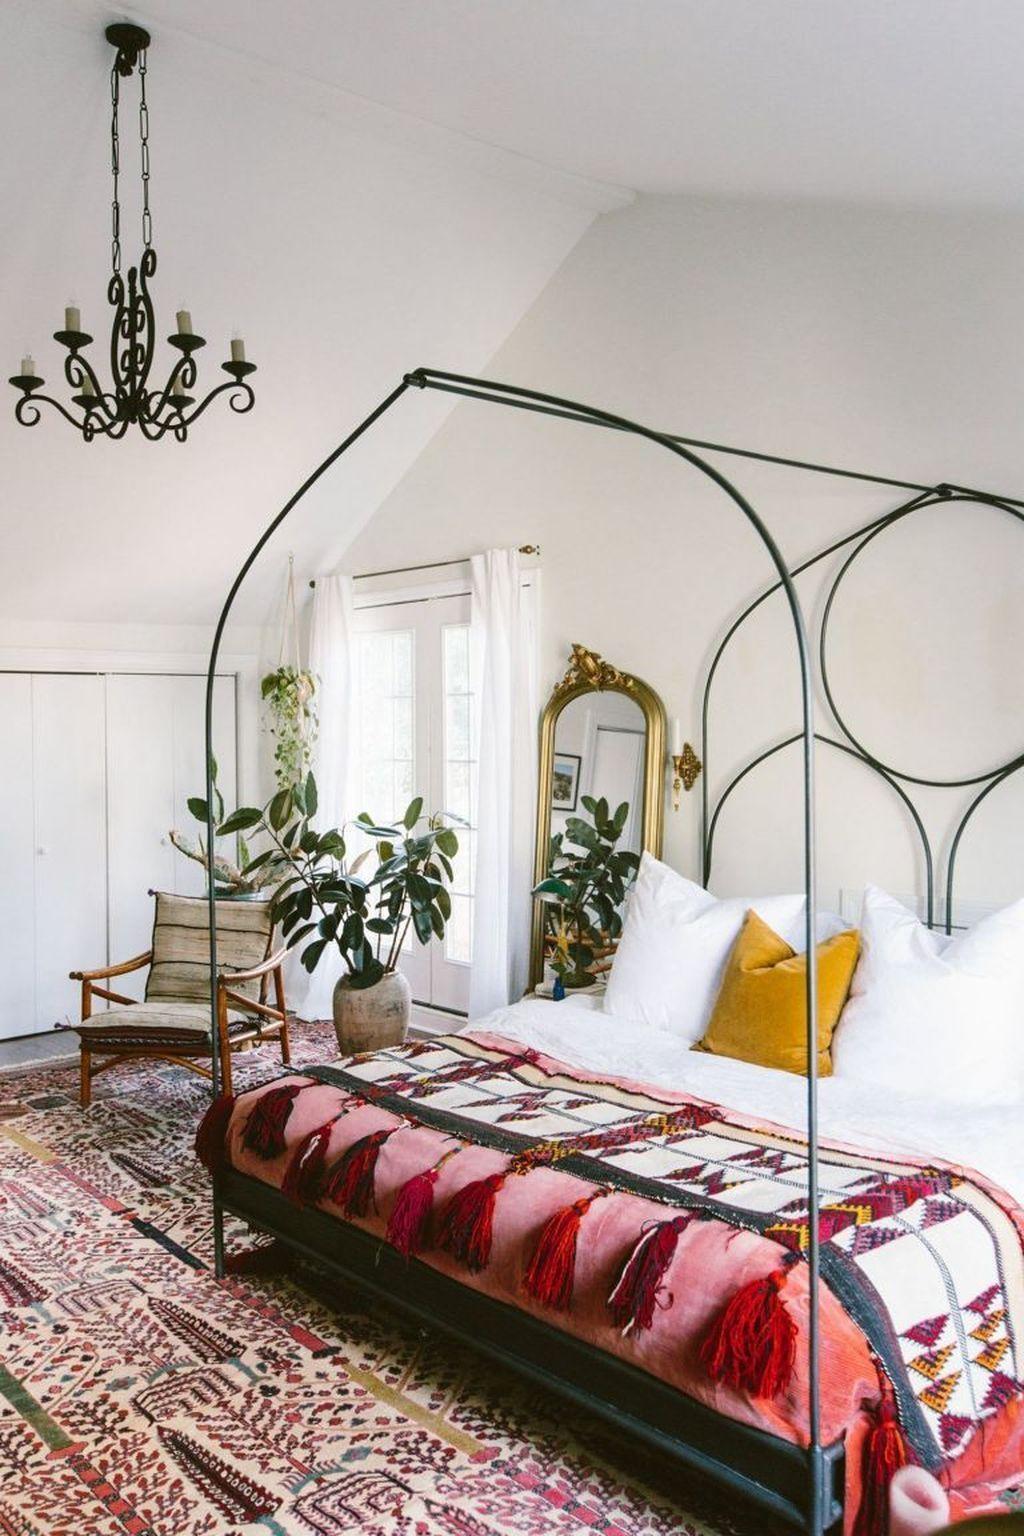 32 Gorgeous Modern Bohemian Bedroom Decor Ideas | Bedroom ... on Modern Bohemian Bedroom Decor  id=48161